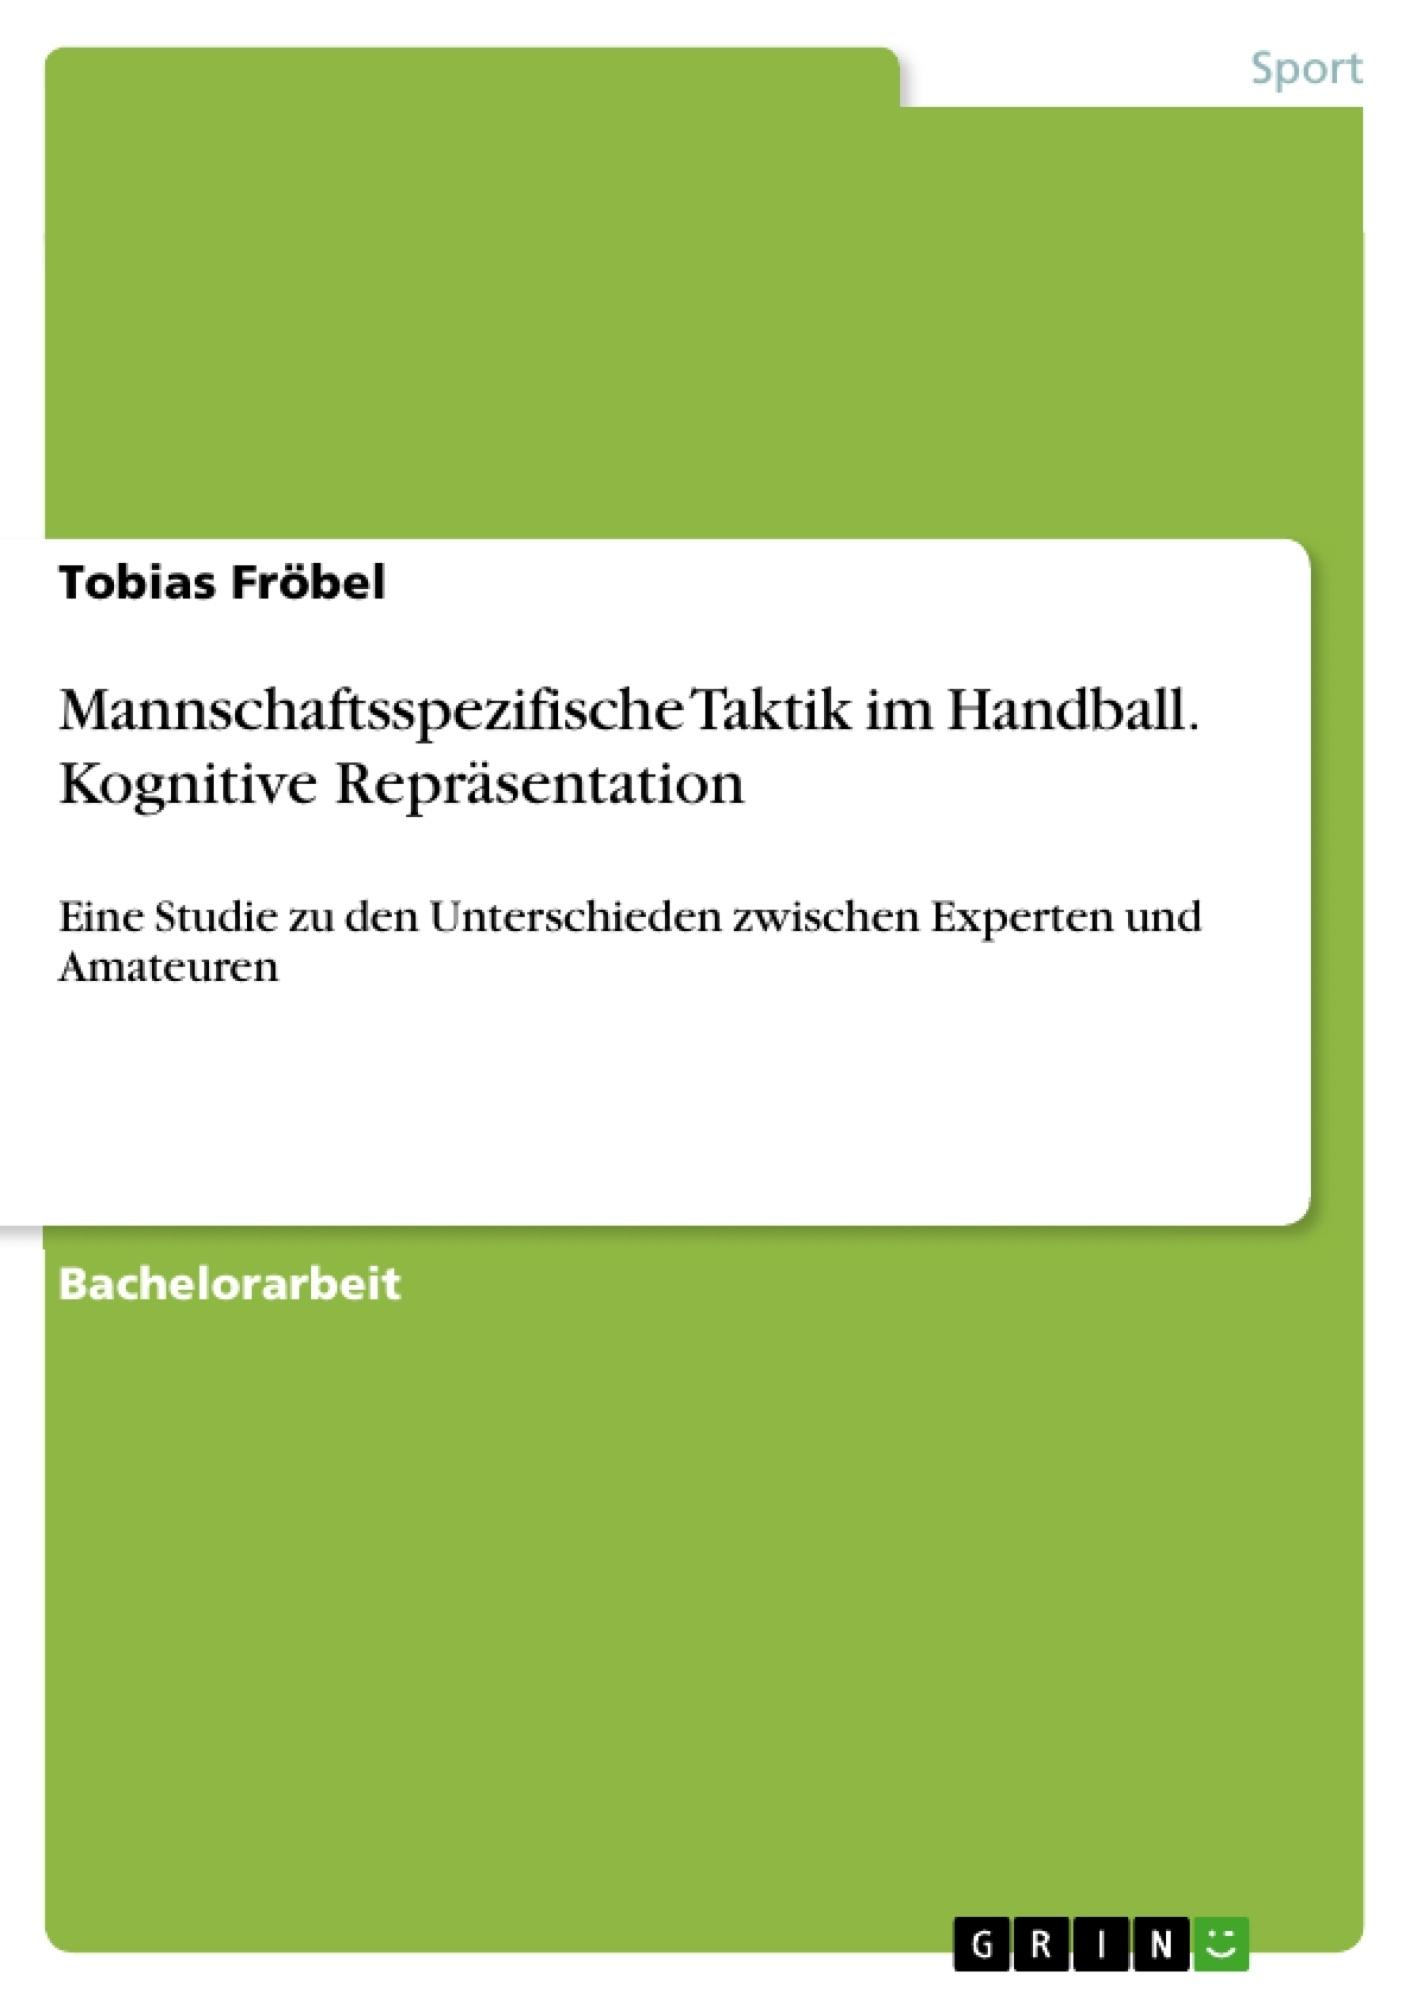 Titel: Mannschaftsspezifische Taktik im Handball. Kognitive Repräsentation